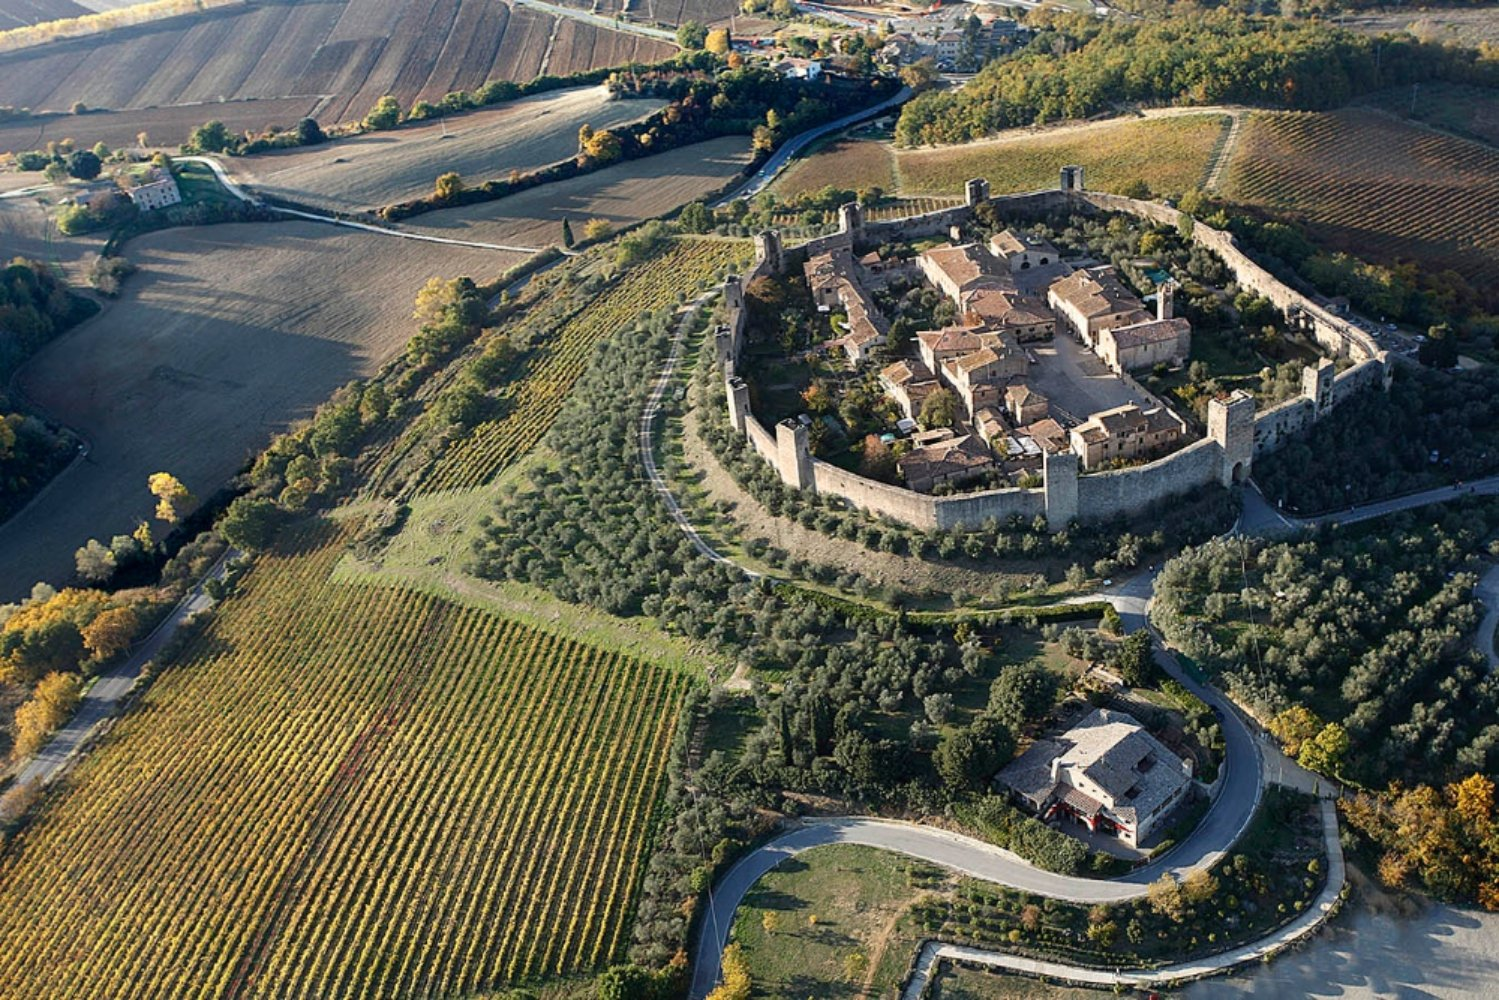 http://www.viaggiavventurenelmondo.it/immagini/francigena2a.JPG